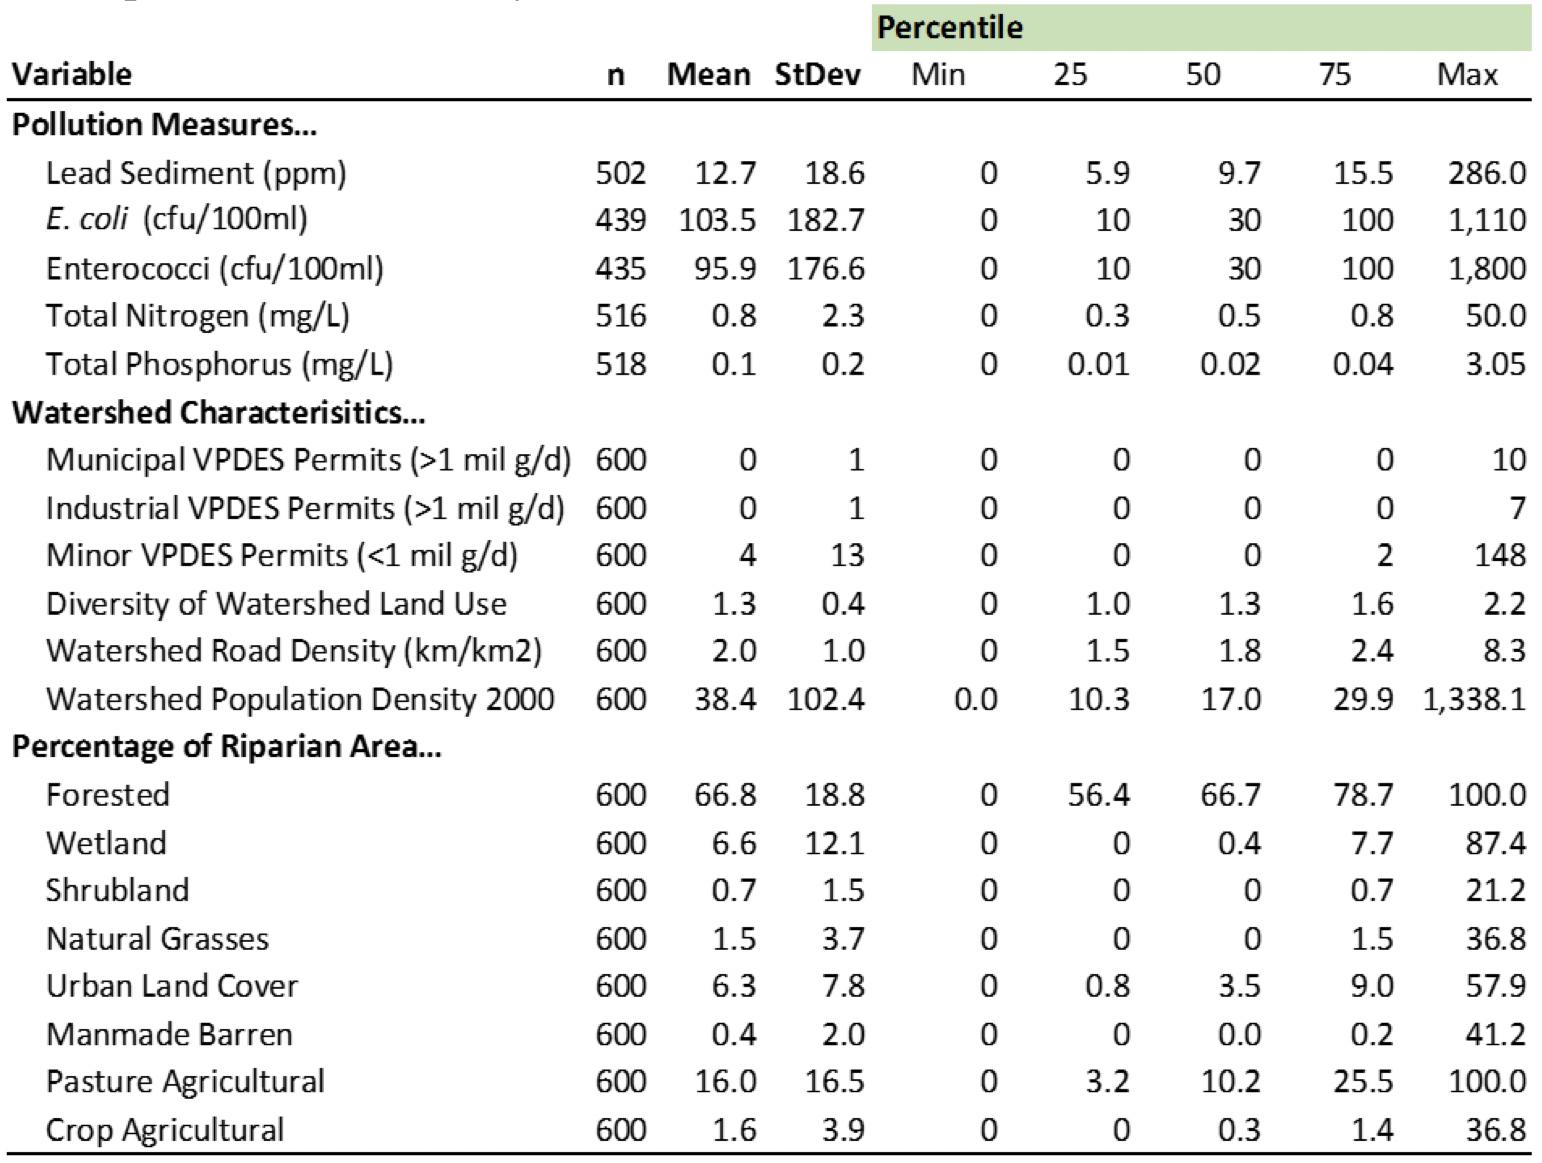 Table       SEQ Table \* ARABIC     1      . Descriptive Statistics of Key Variables from ProbMon Data.